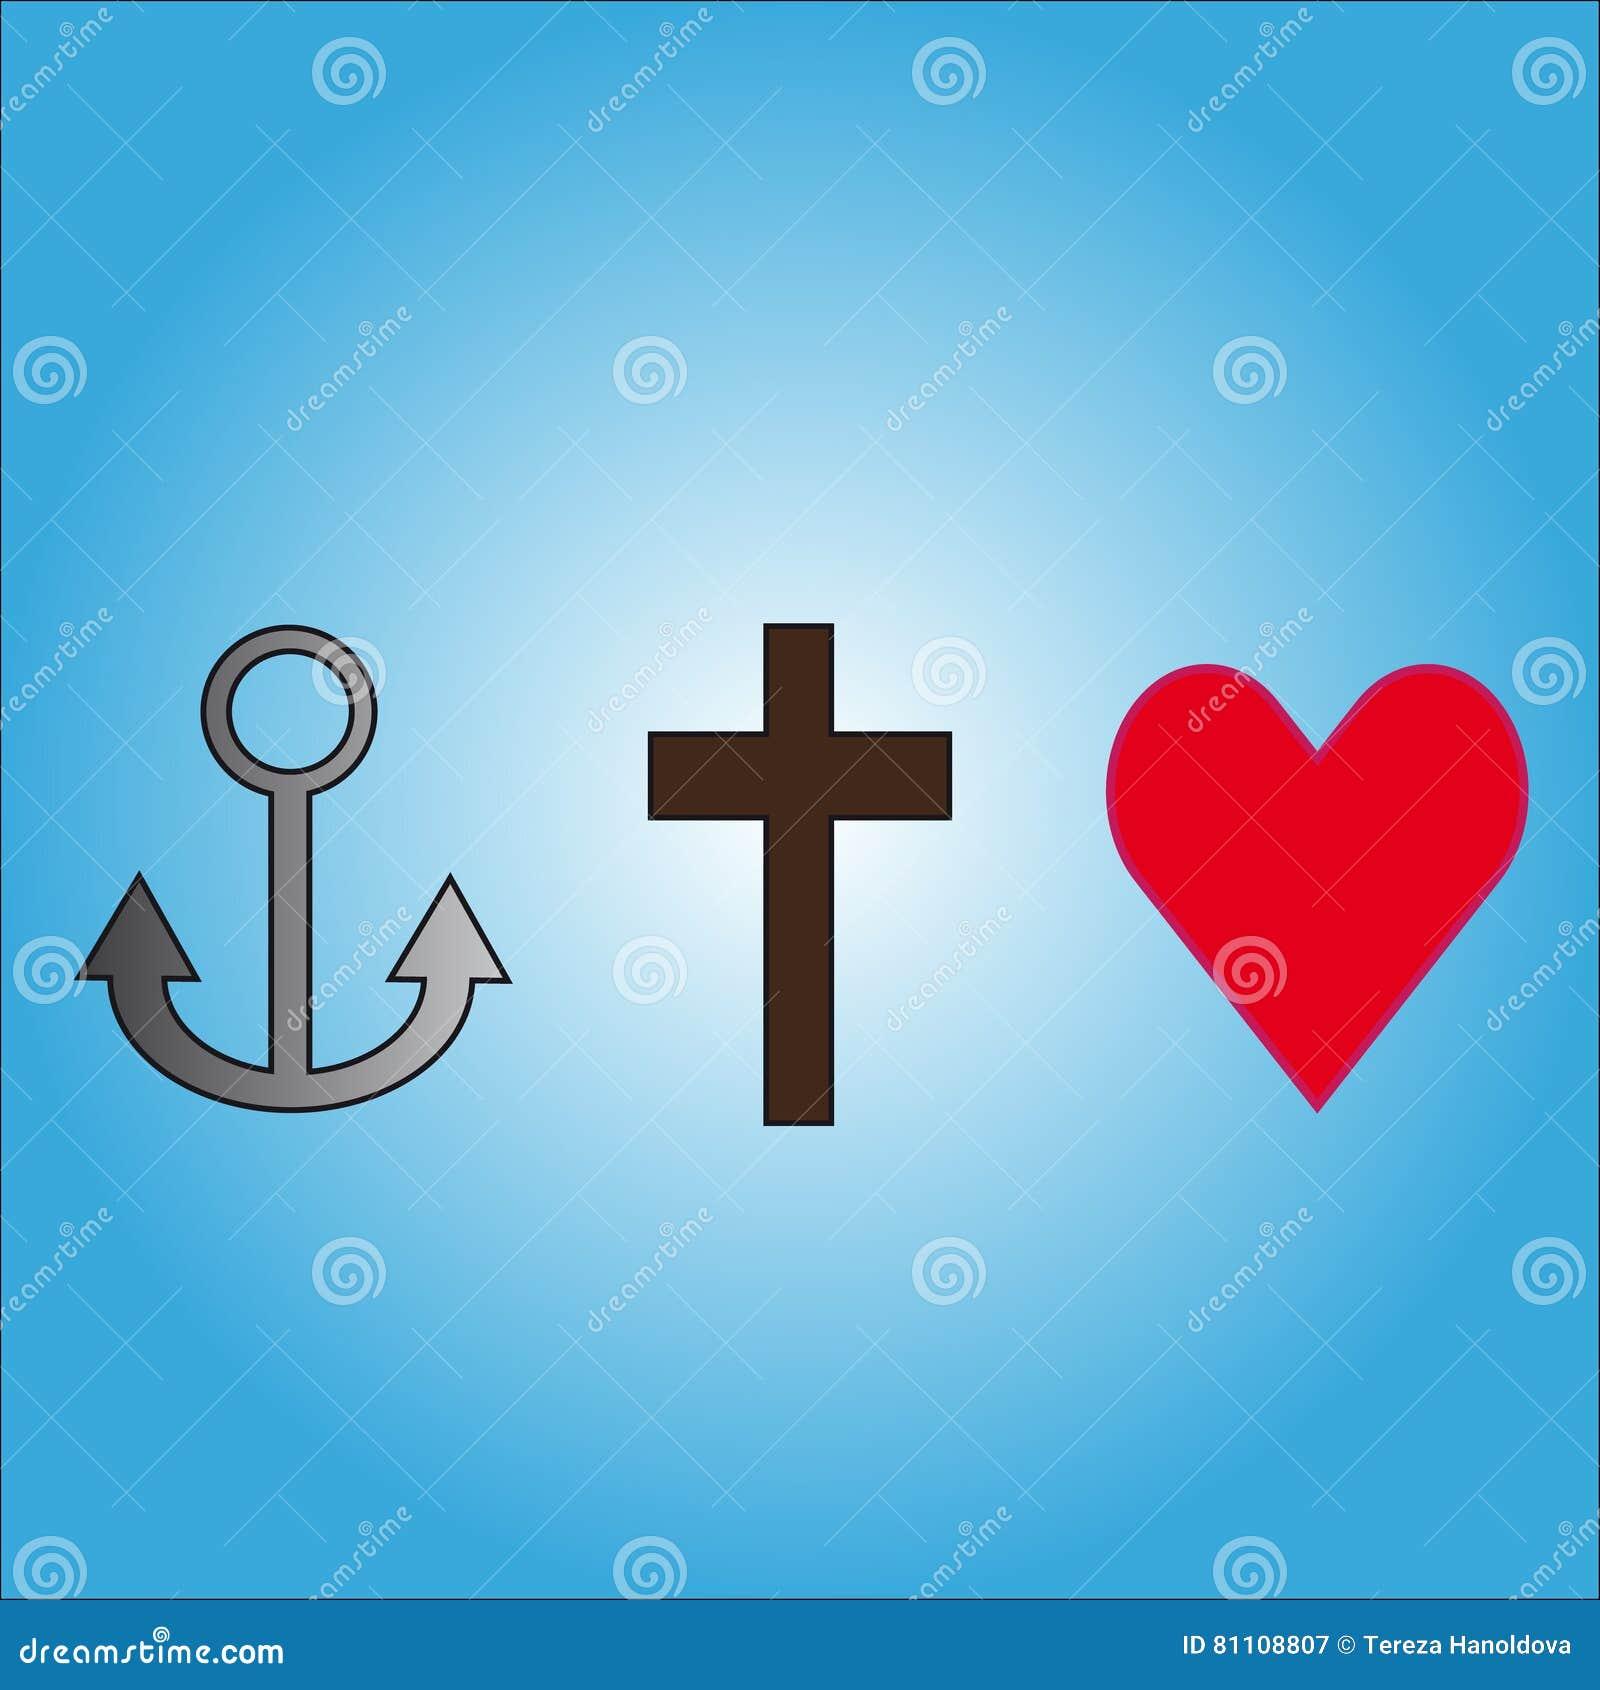 Symbols Love, Faith, Hope Stock Vector - Image: 81108807